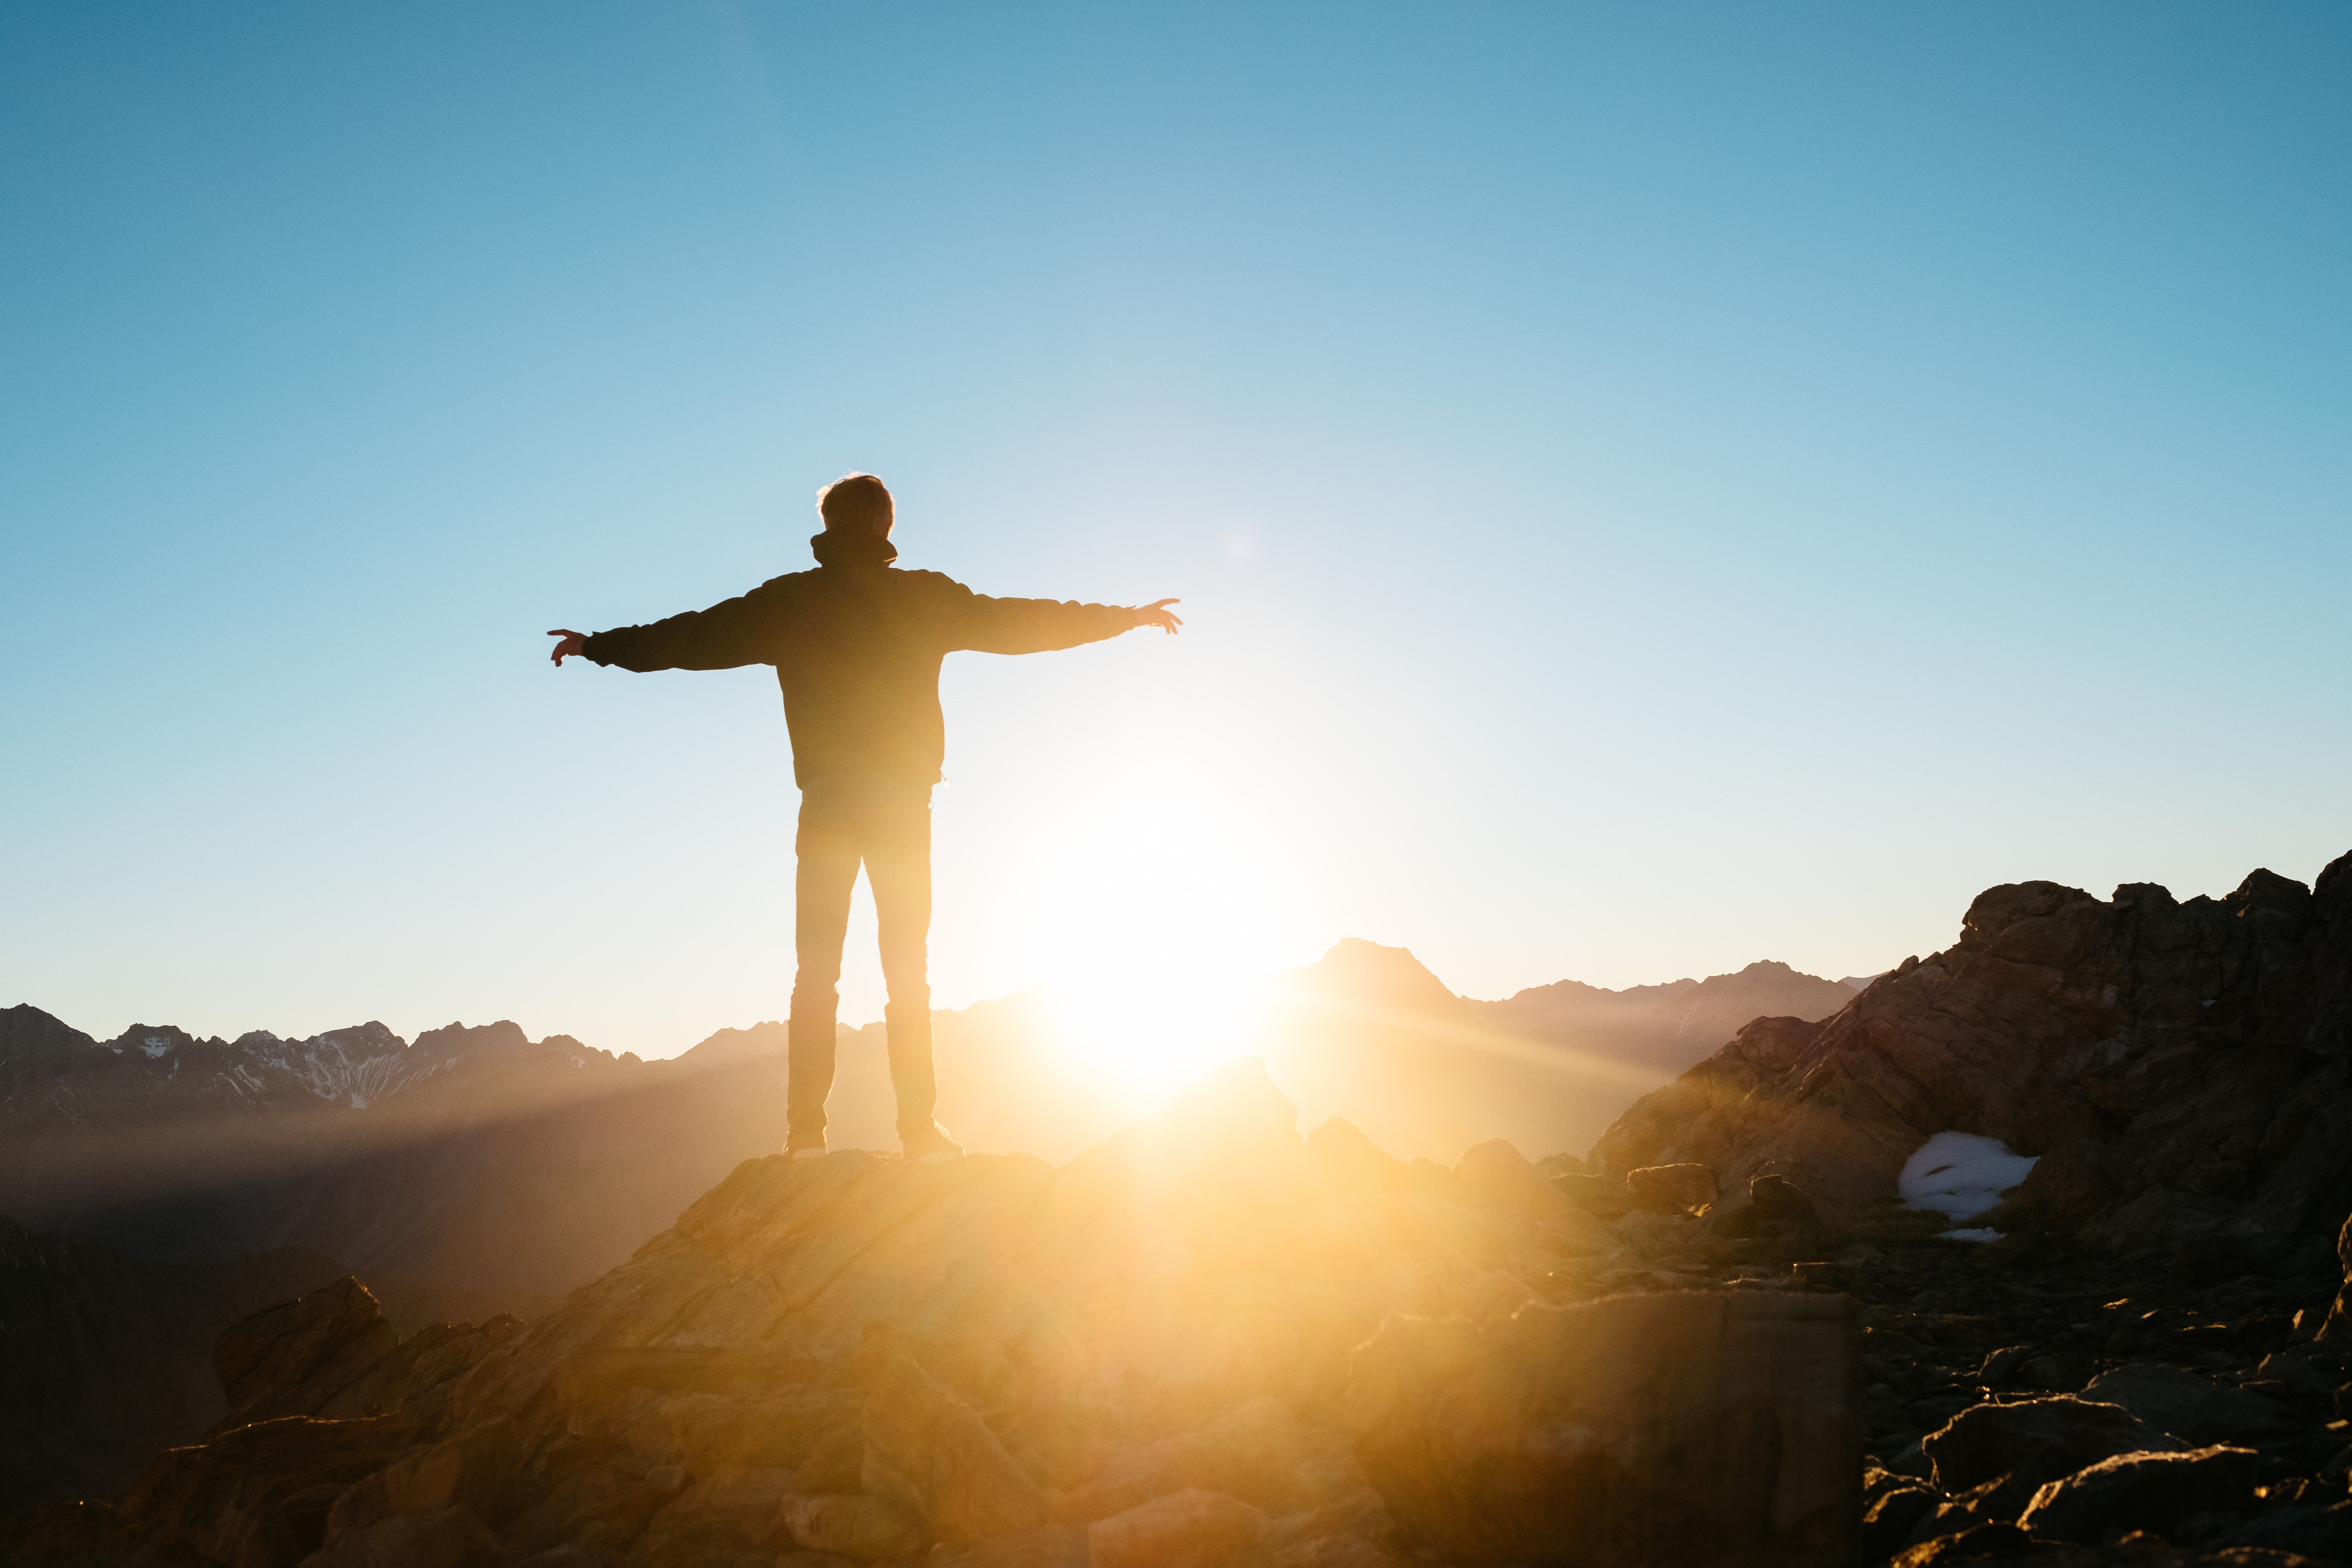 Intrinsieke motivatie: Waarom doe jij wat je doet?